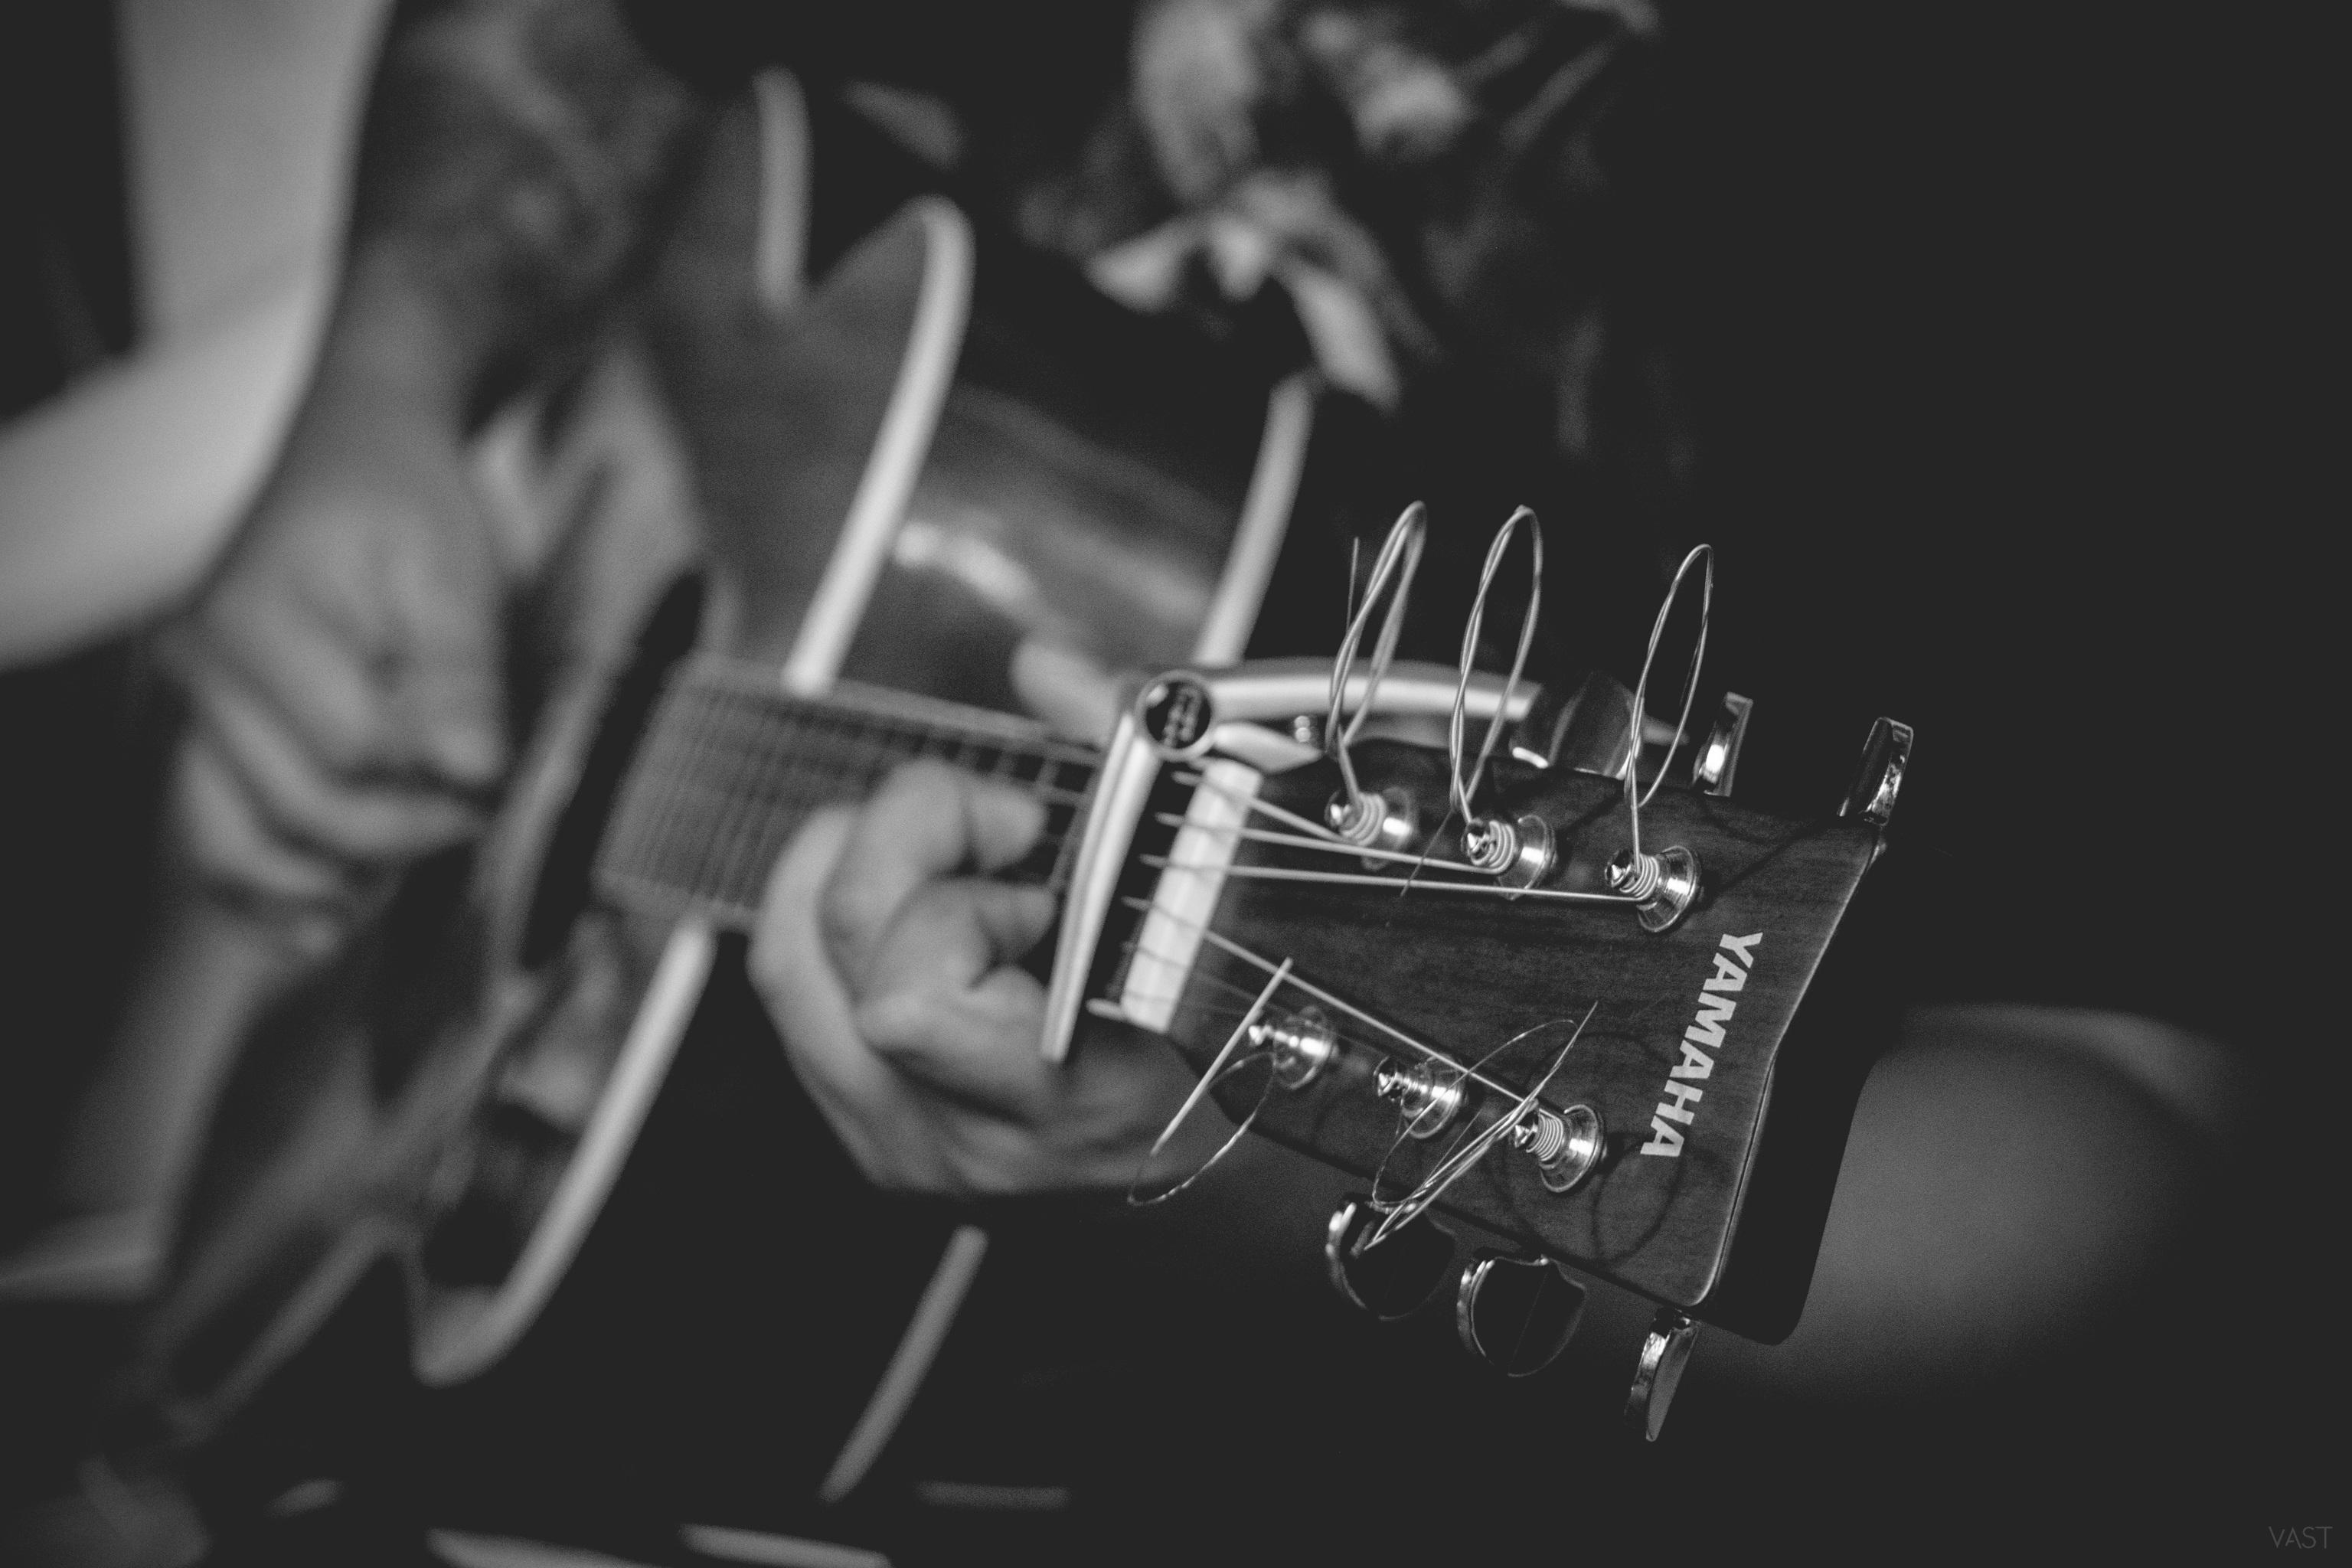 Guitar, Activity, Black, Guitarist, Human, HQ Photo